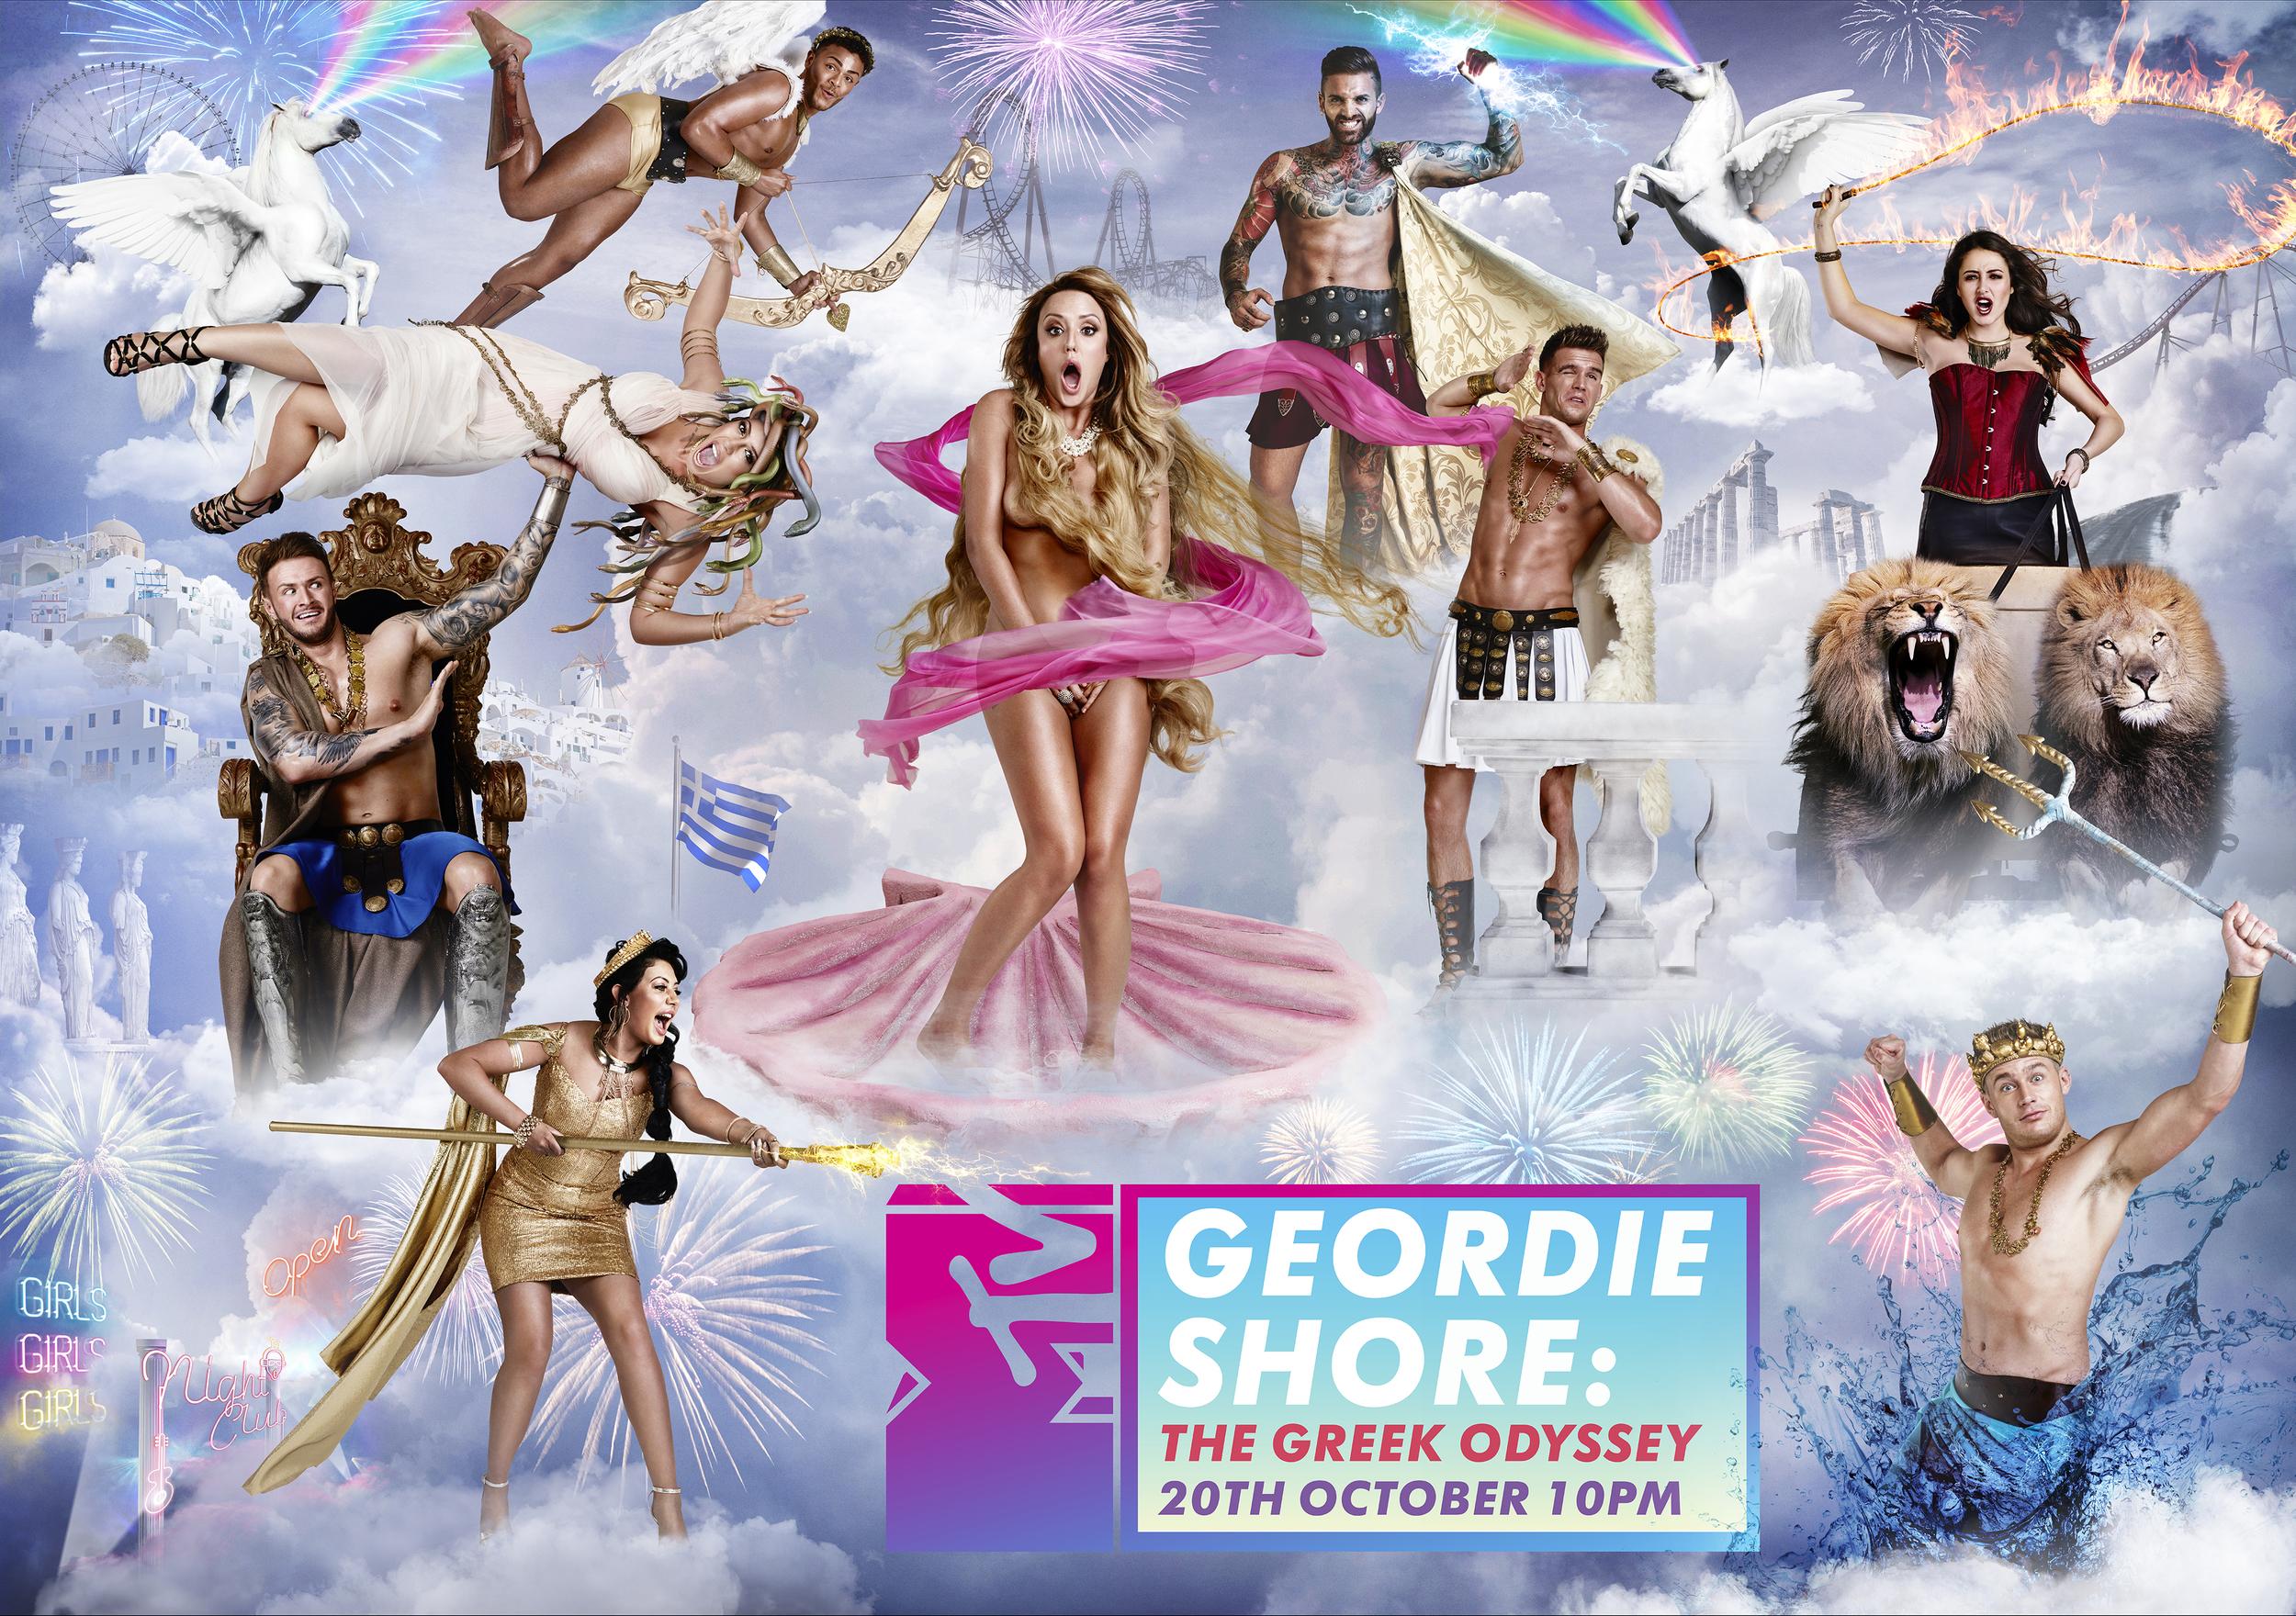 MTV Geordie Shore Key Art Campaign - 'The Greek Odyssey'